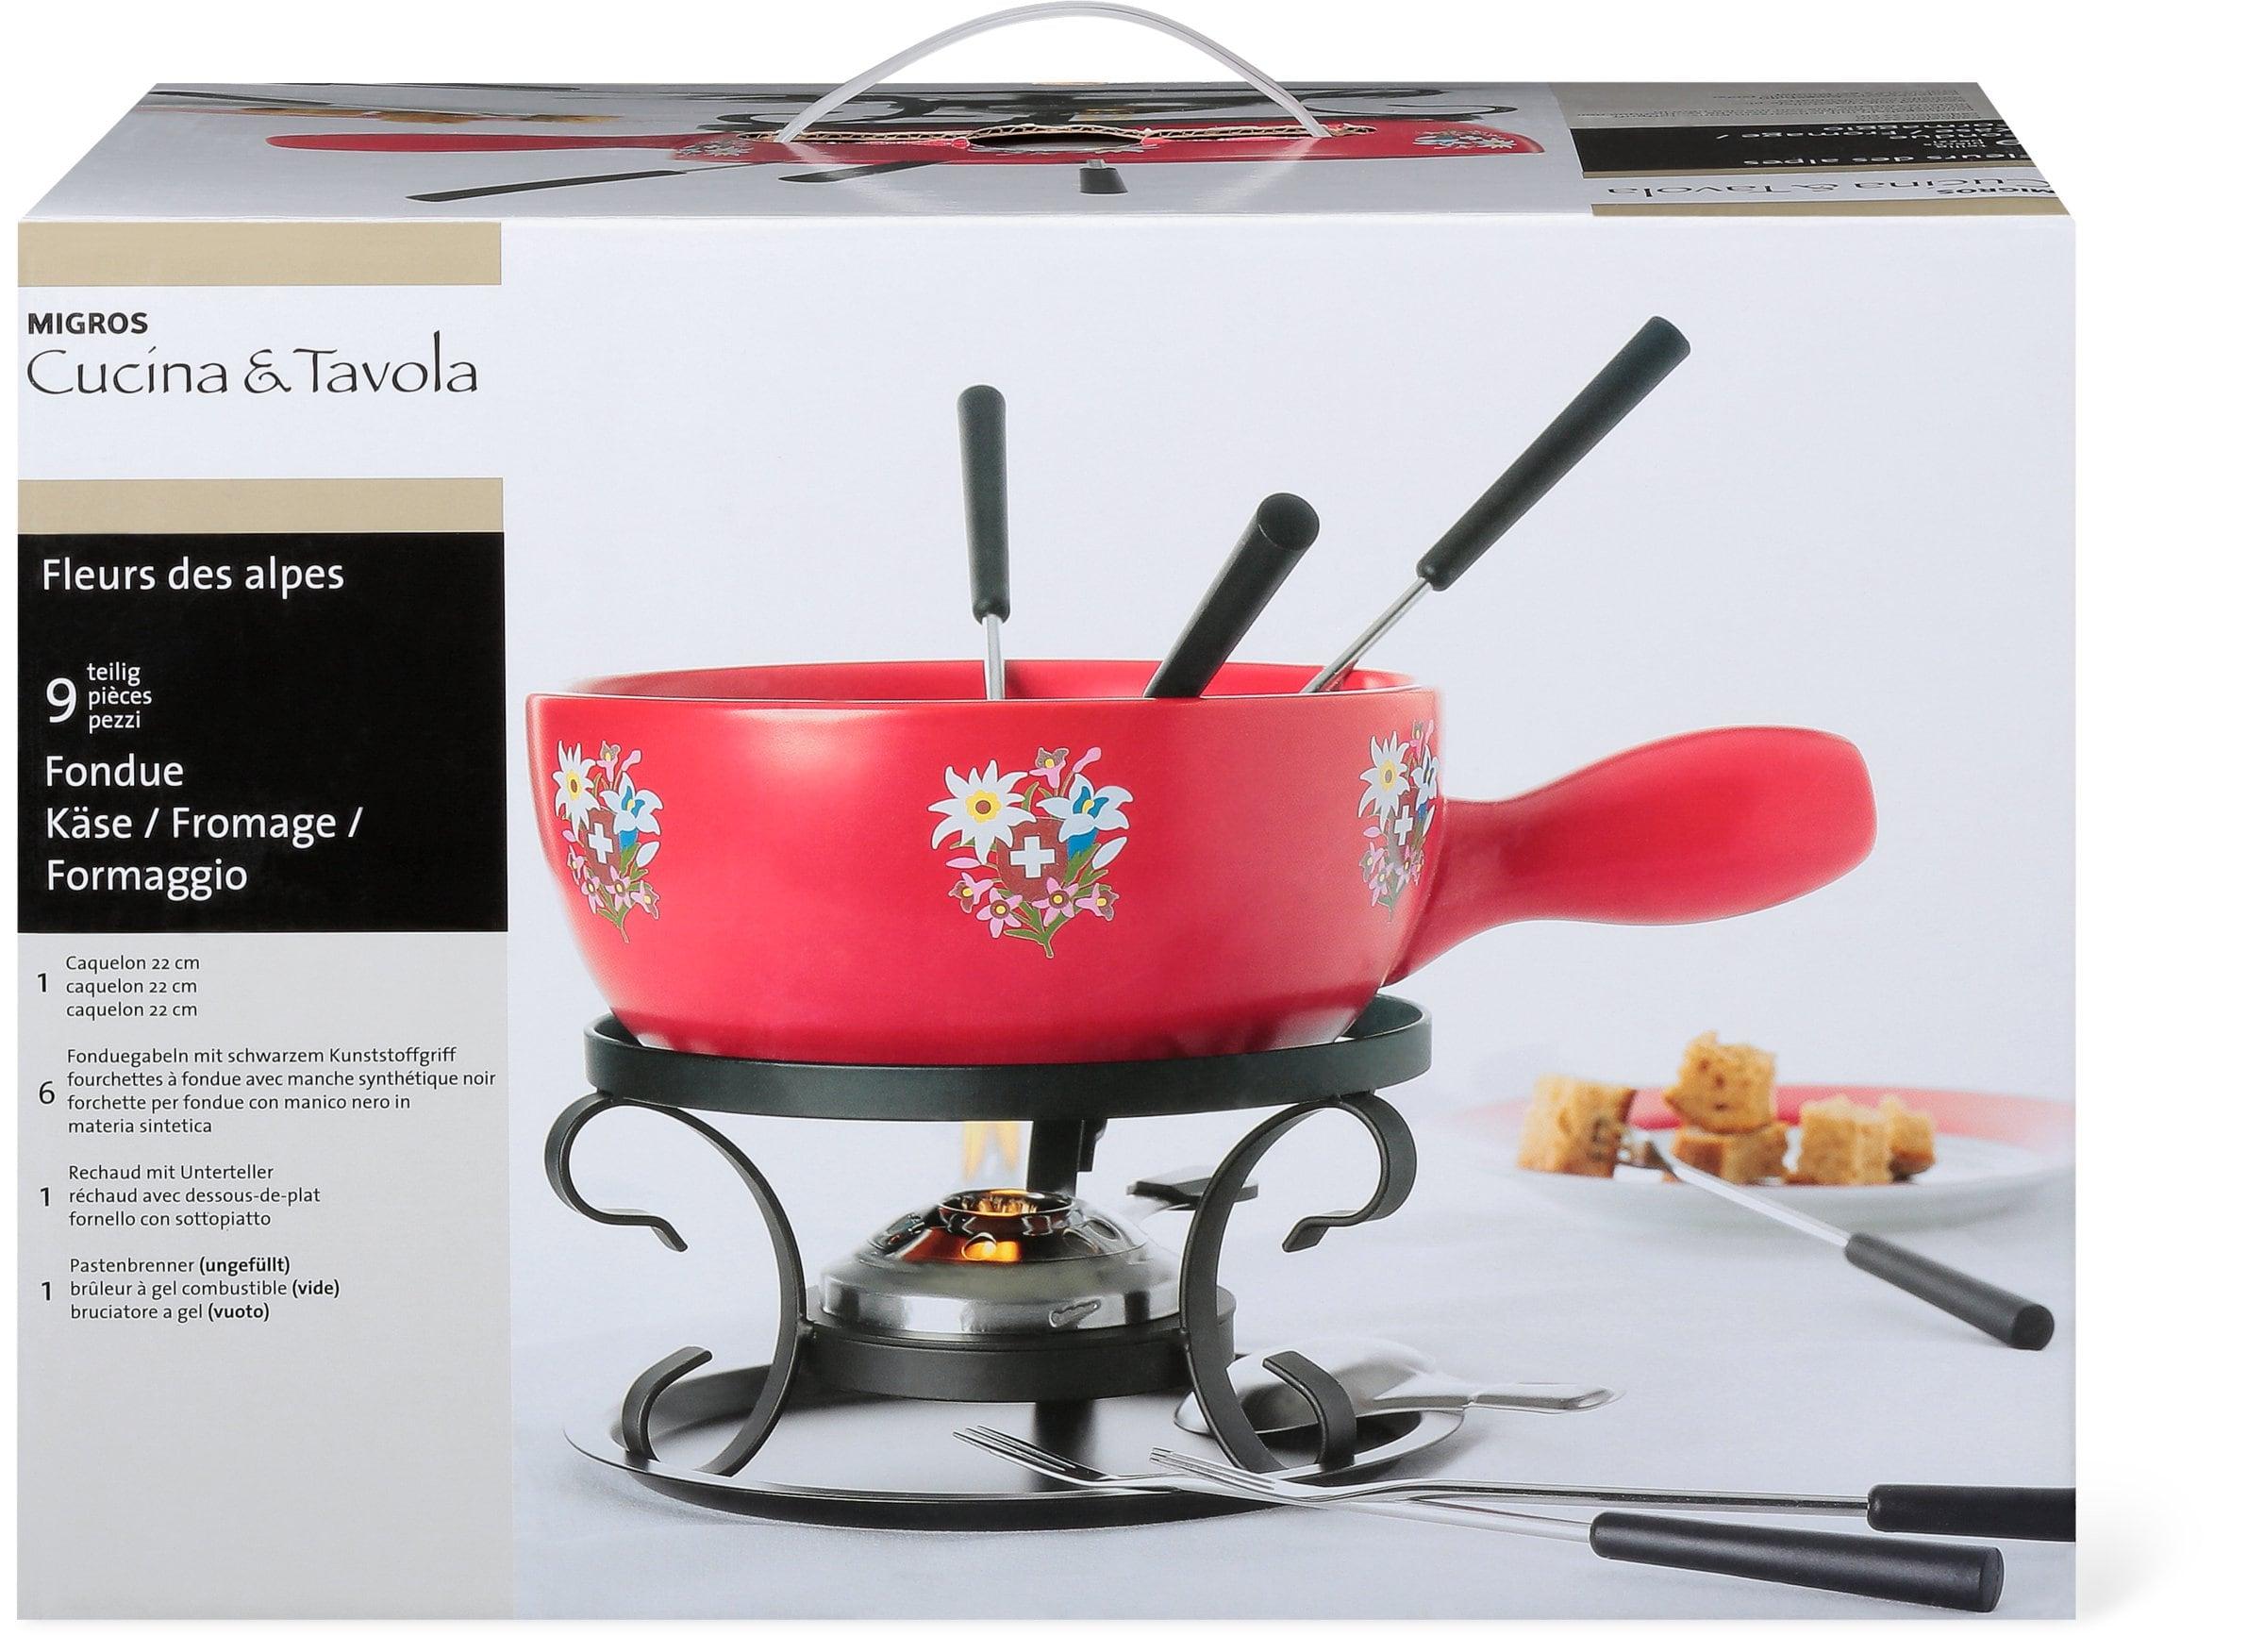 Cucina tavola fleurs des alpes k se fondue set migros for Cucina tavola